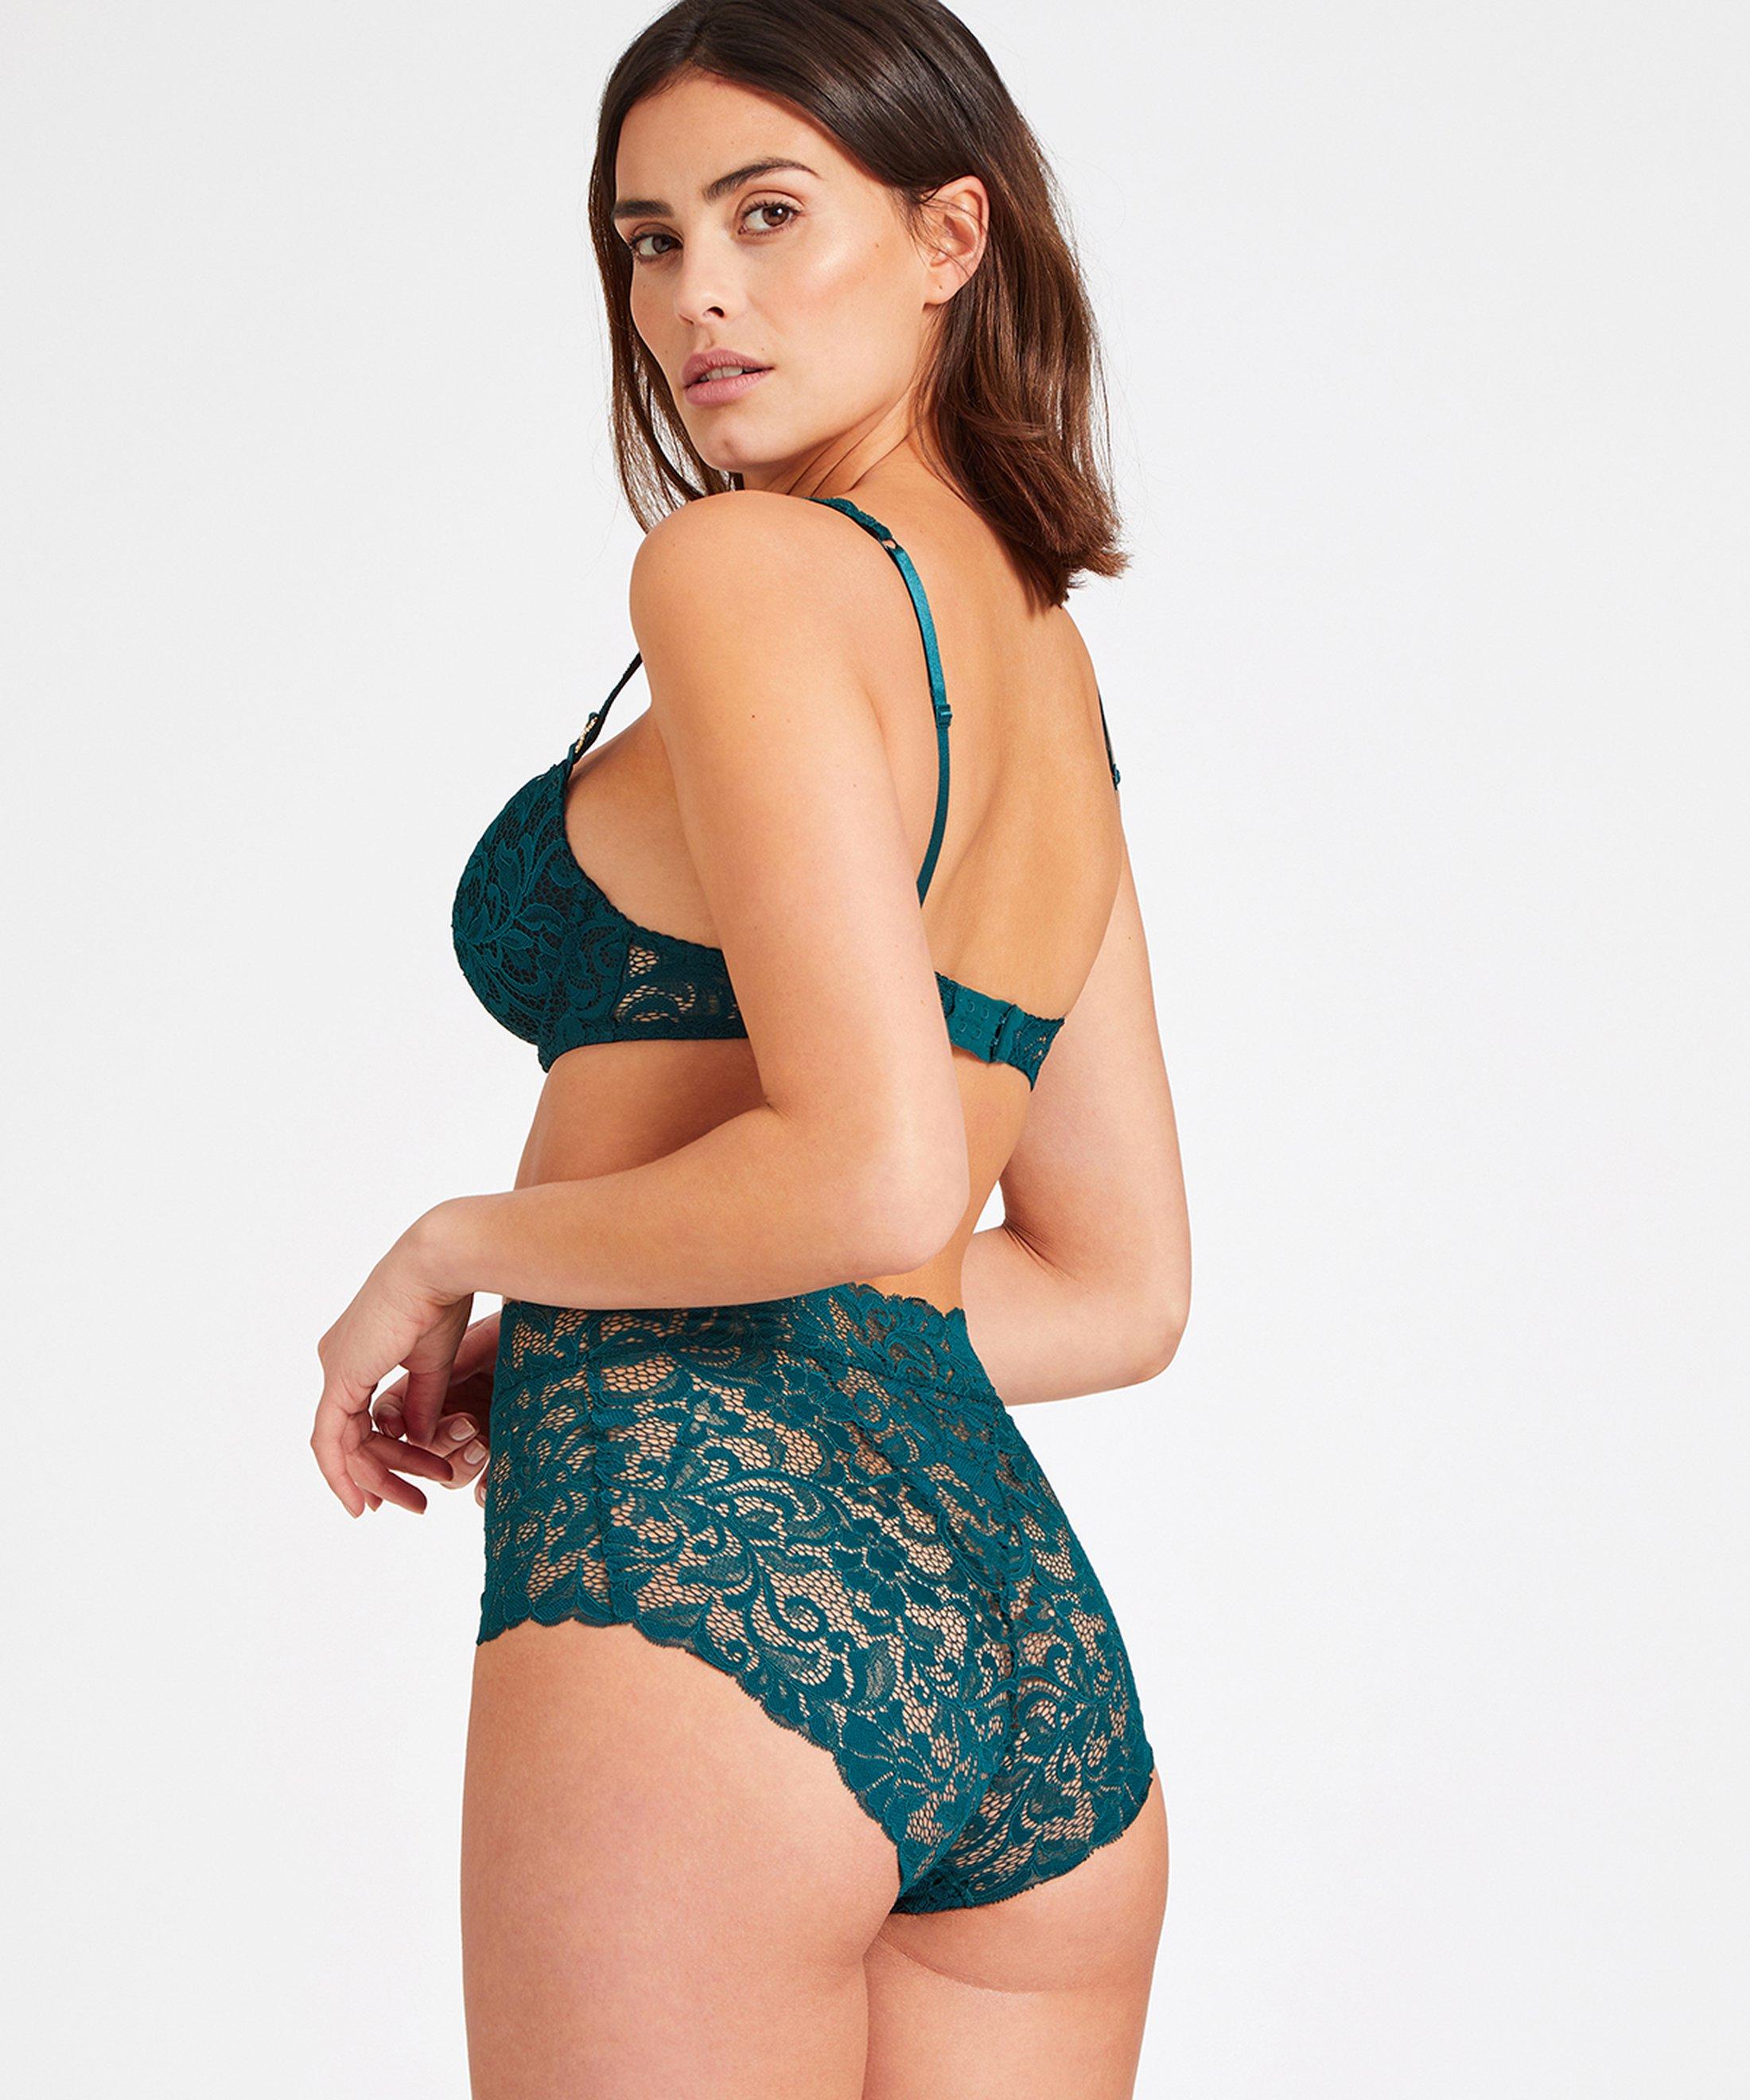 MON BIJOU High-waist brief Green Emeraude | Aubade